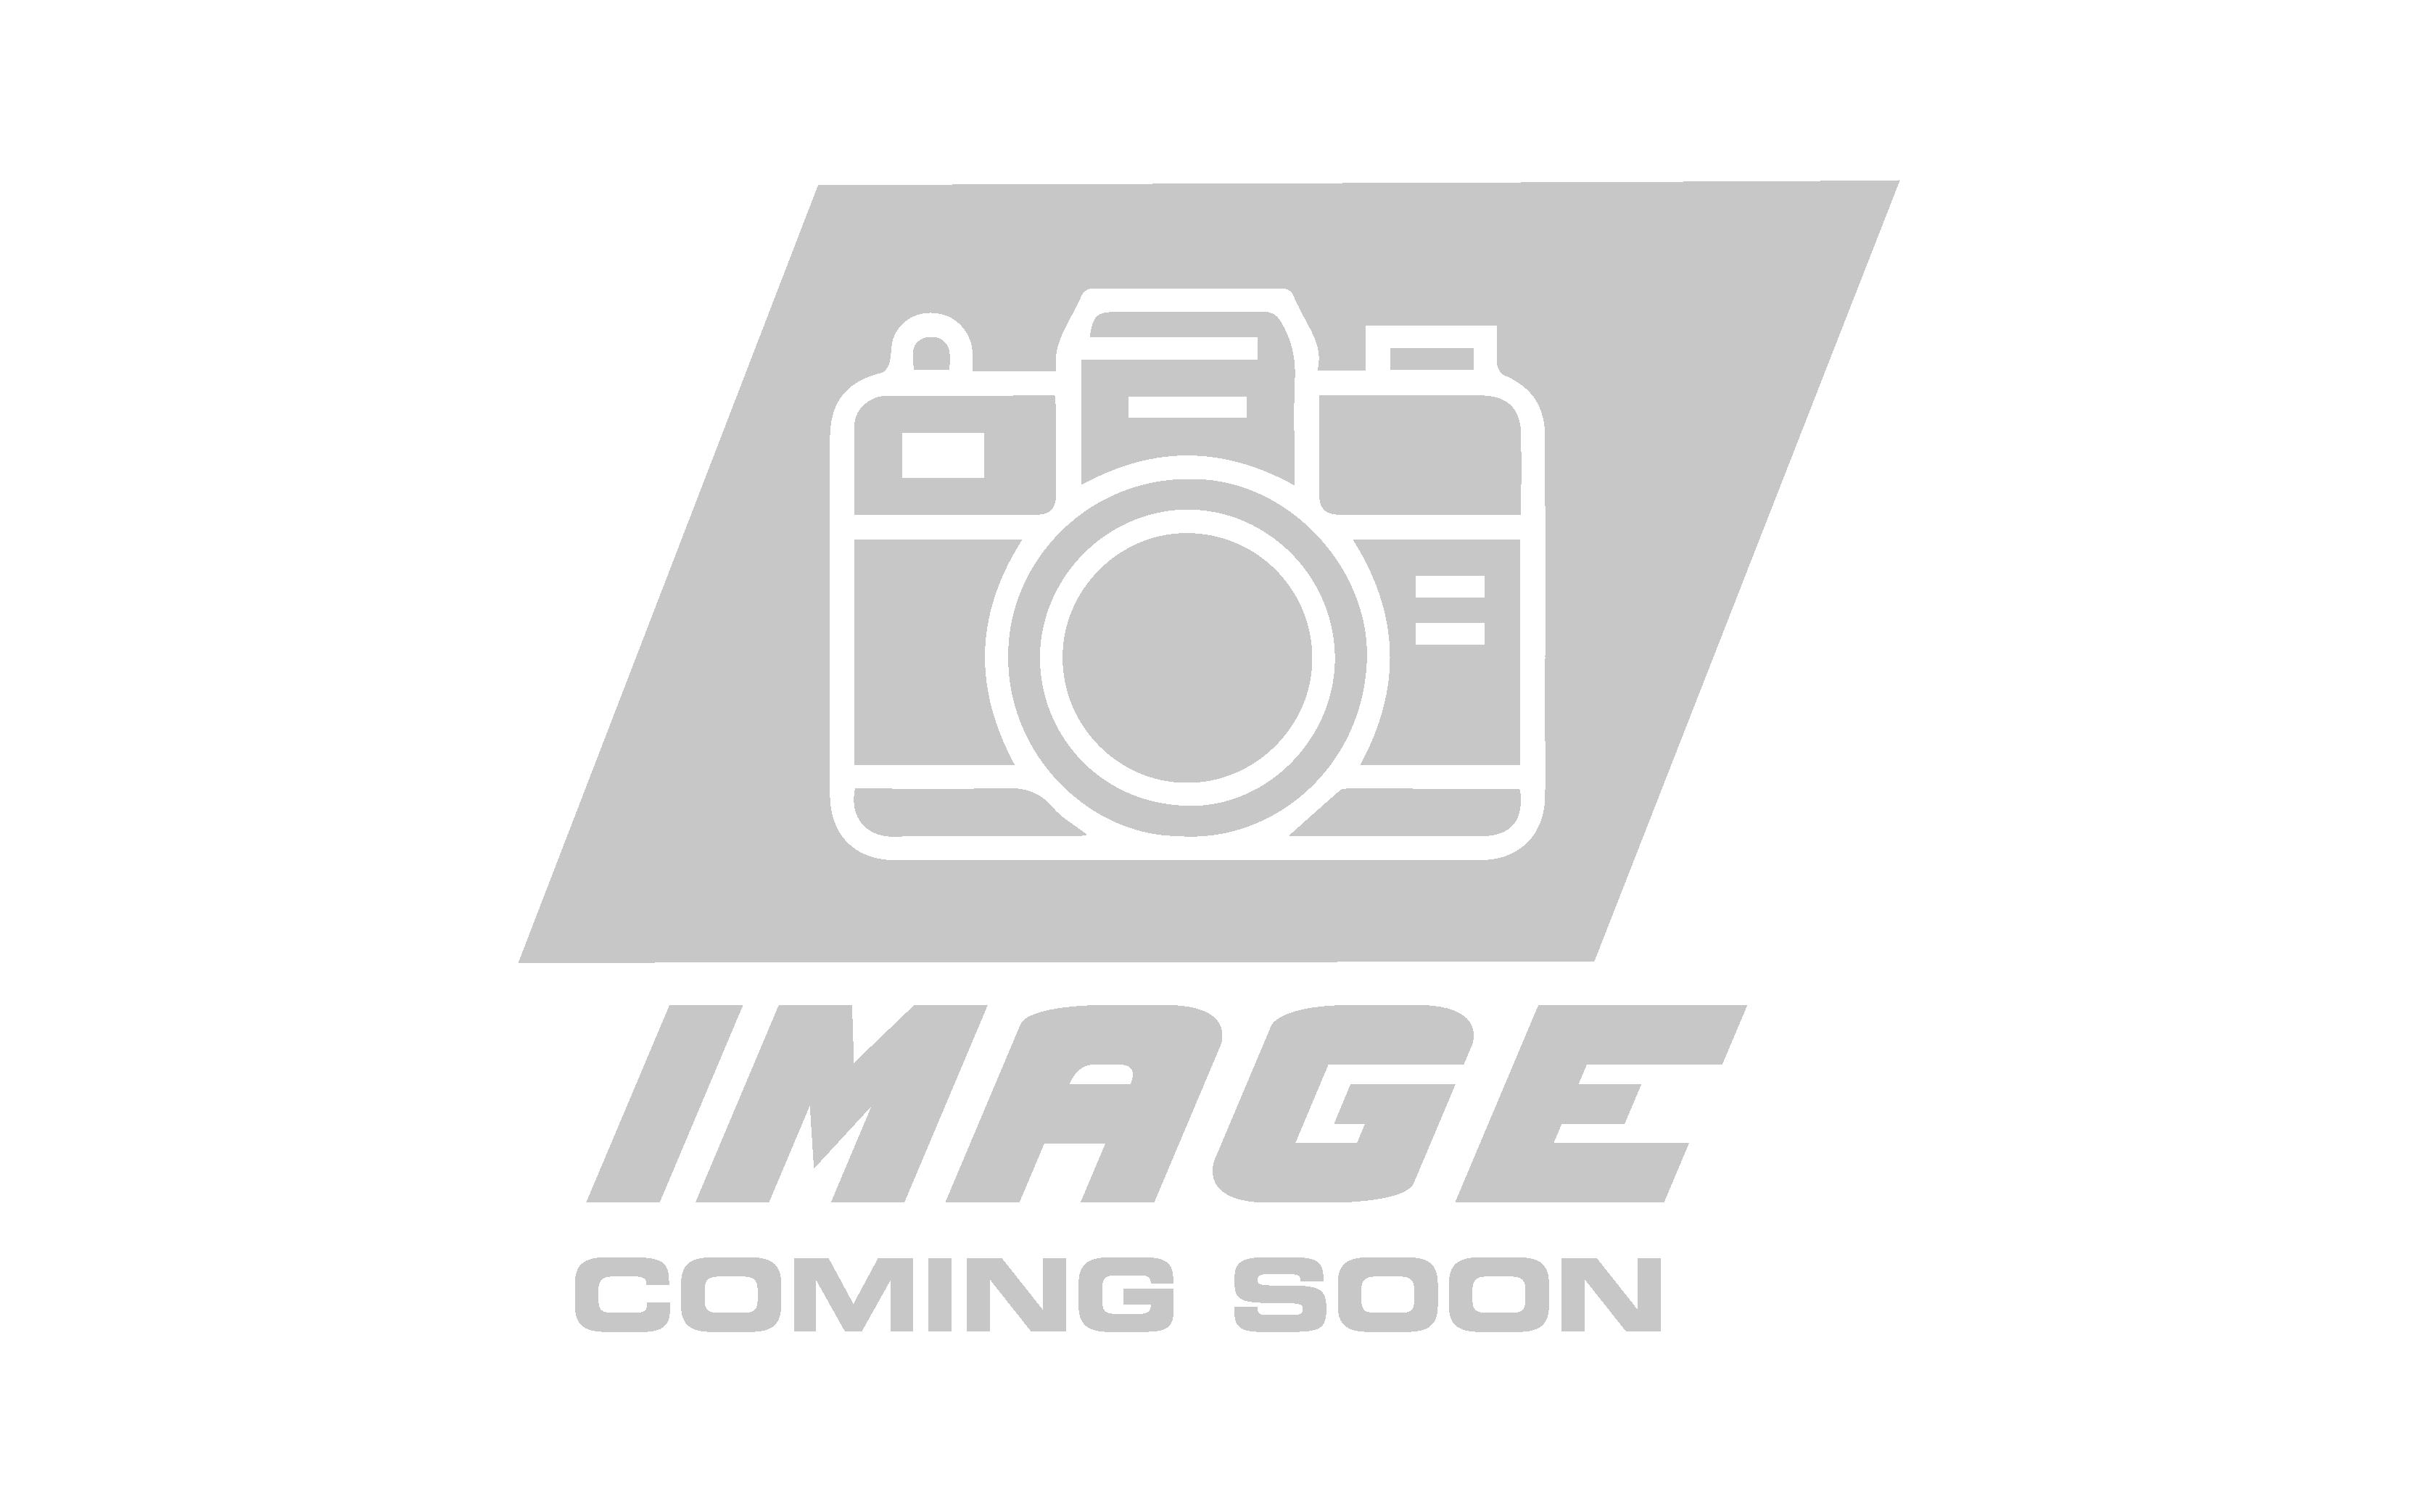 dodge_ram_1500_3rd_gen_air_lift_loadlifter_5000_ultimate_rear_kit_88257